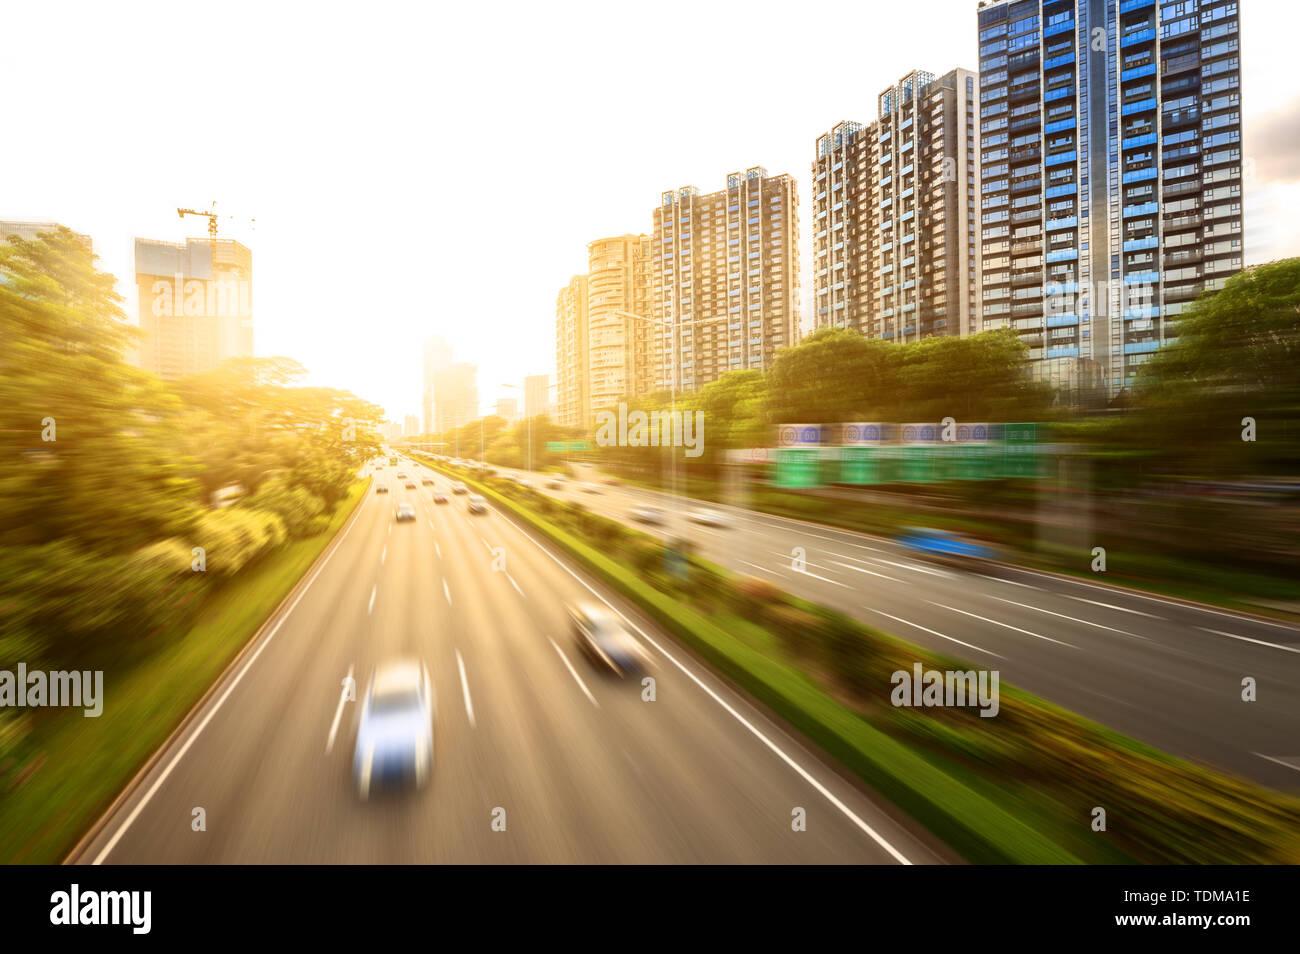 busy asphalt road in modern city under twilight - Stock Image